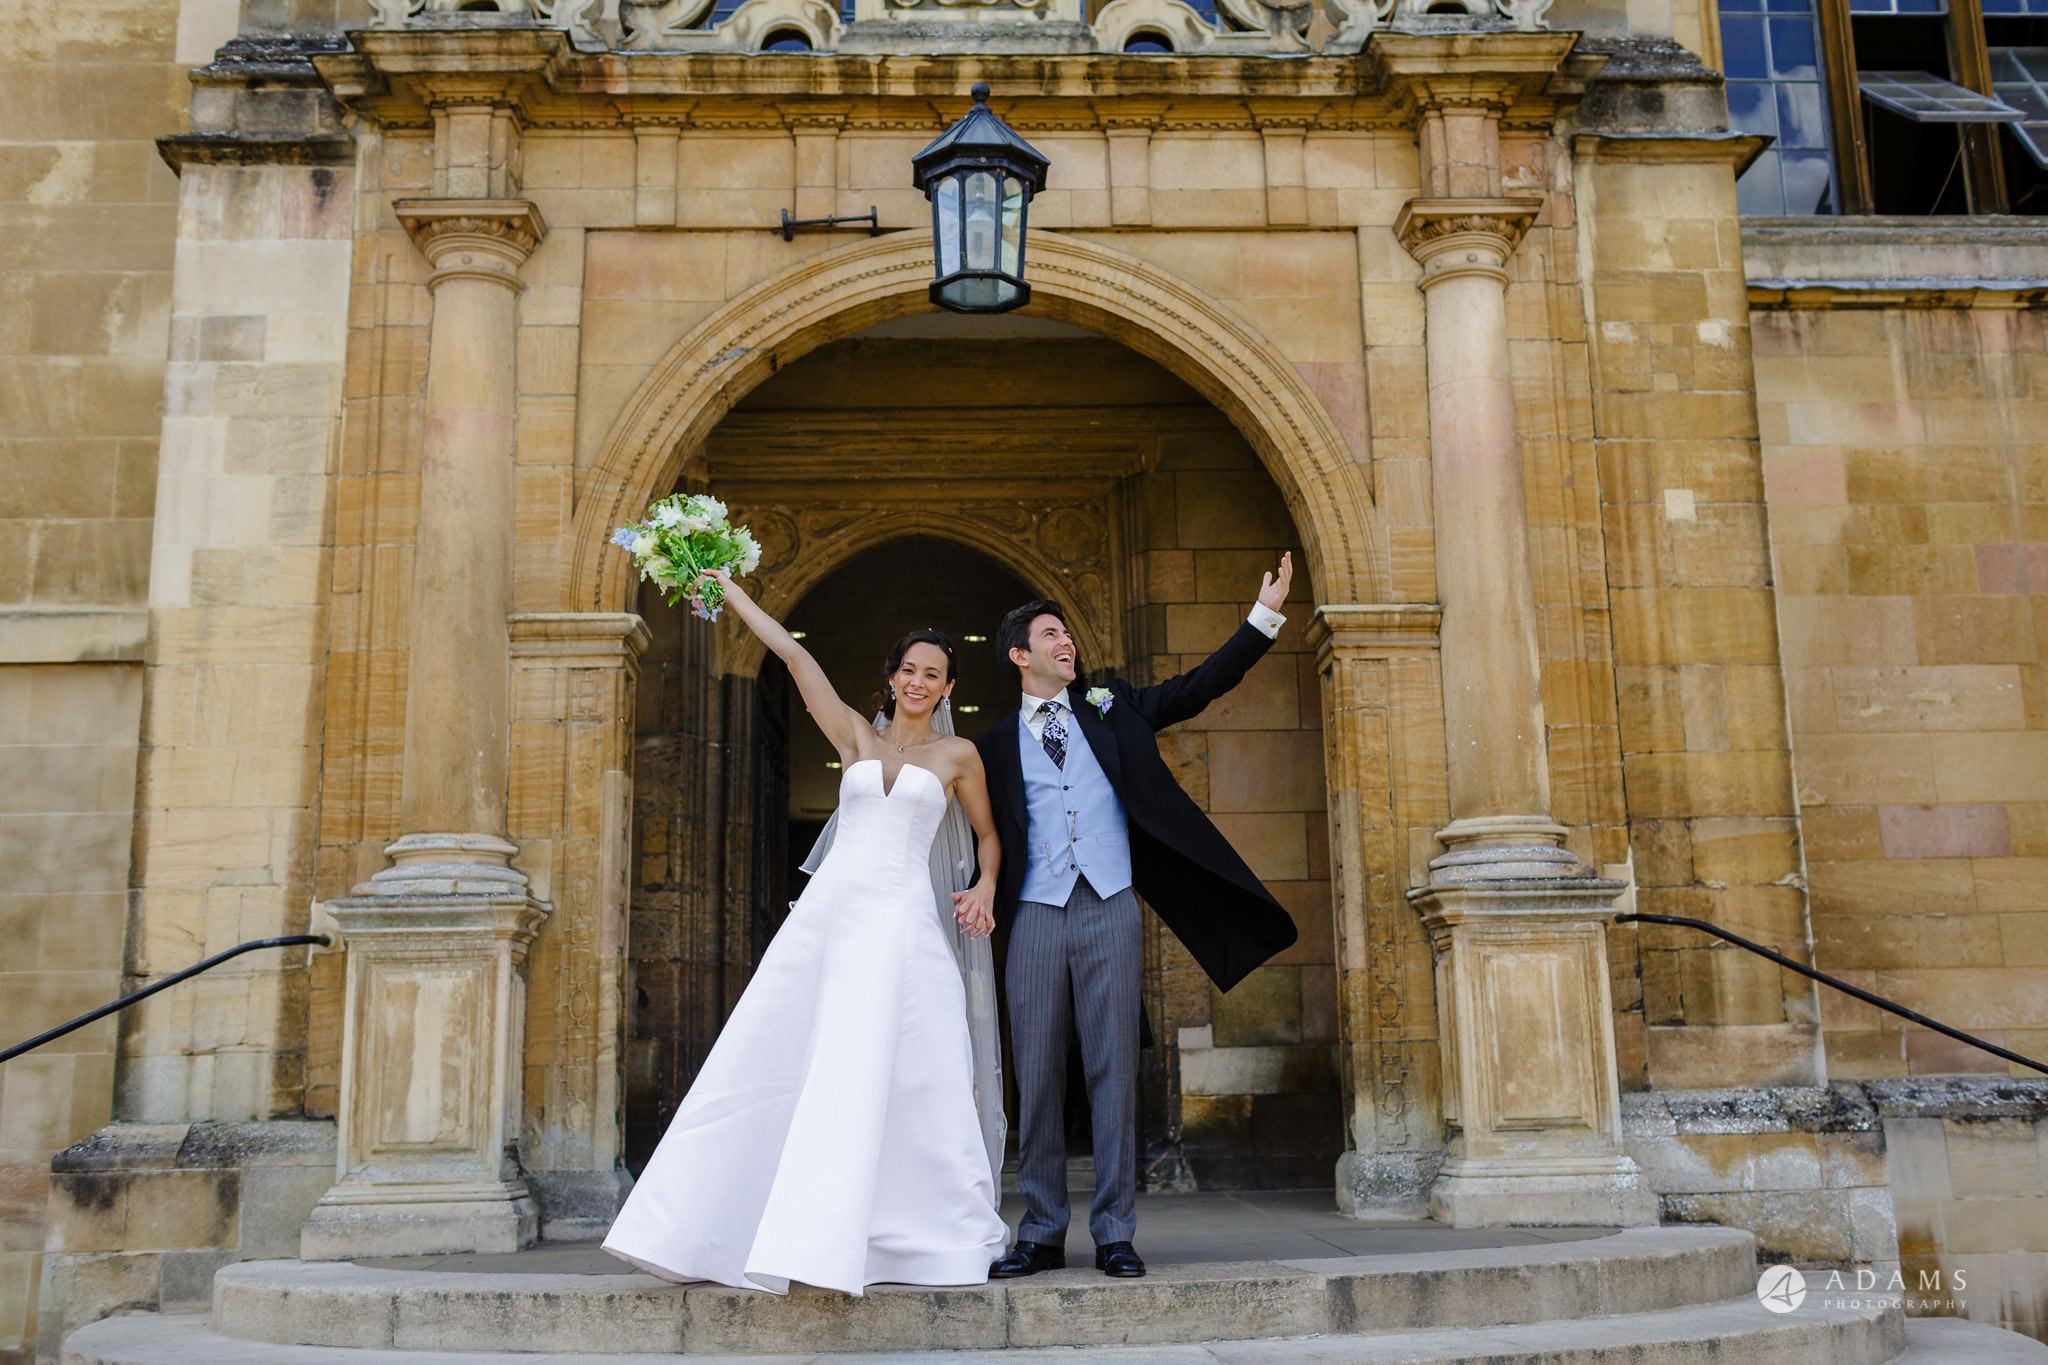 Trinity College Cambridge wedding bride and groom raise their hands